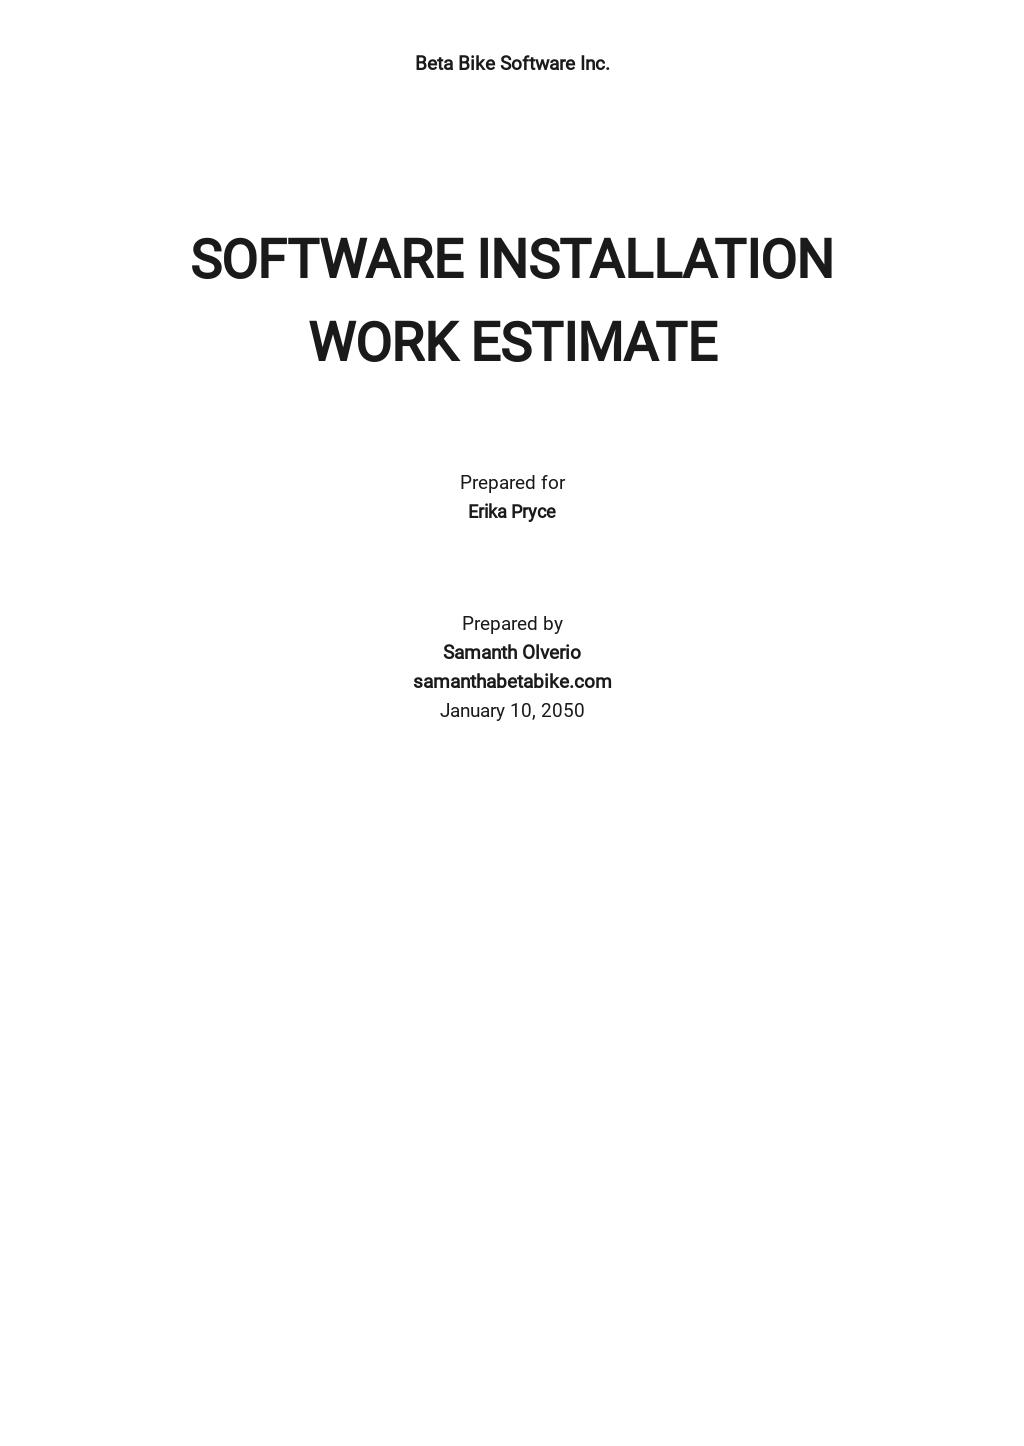 Software Work Estimate Template